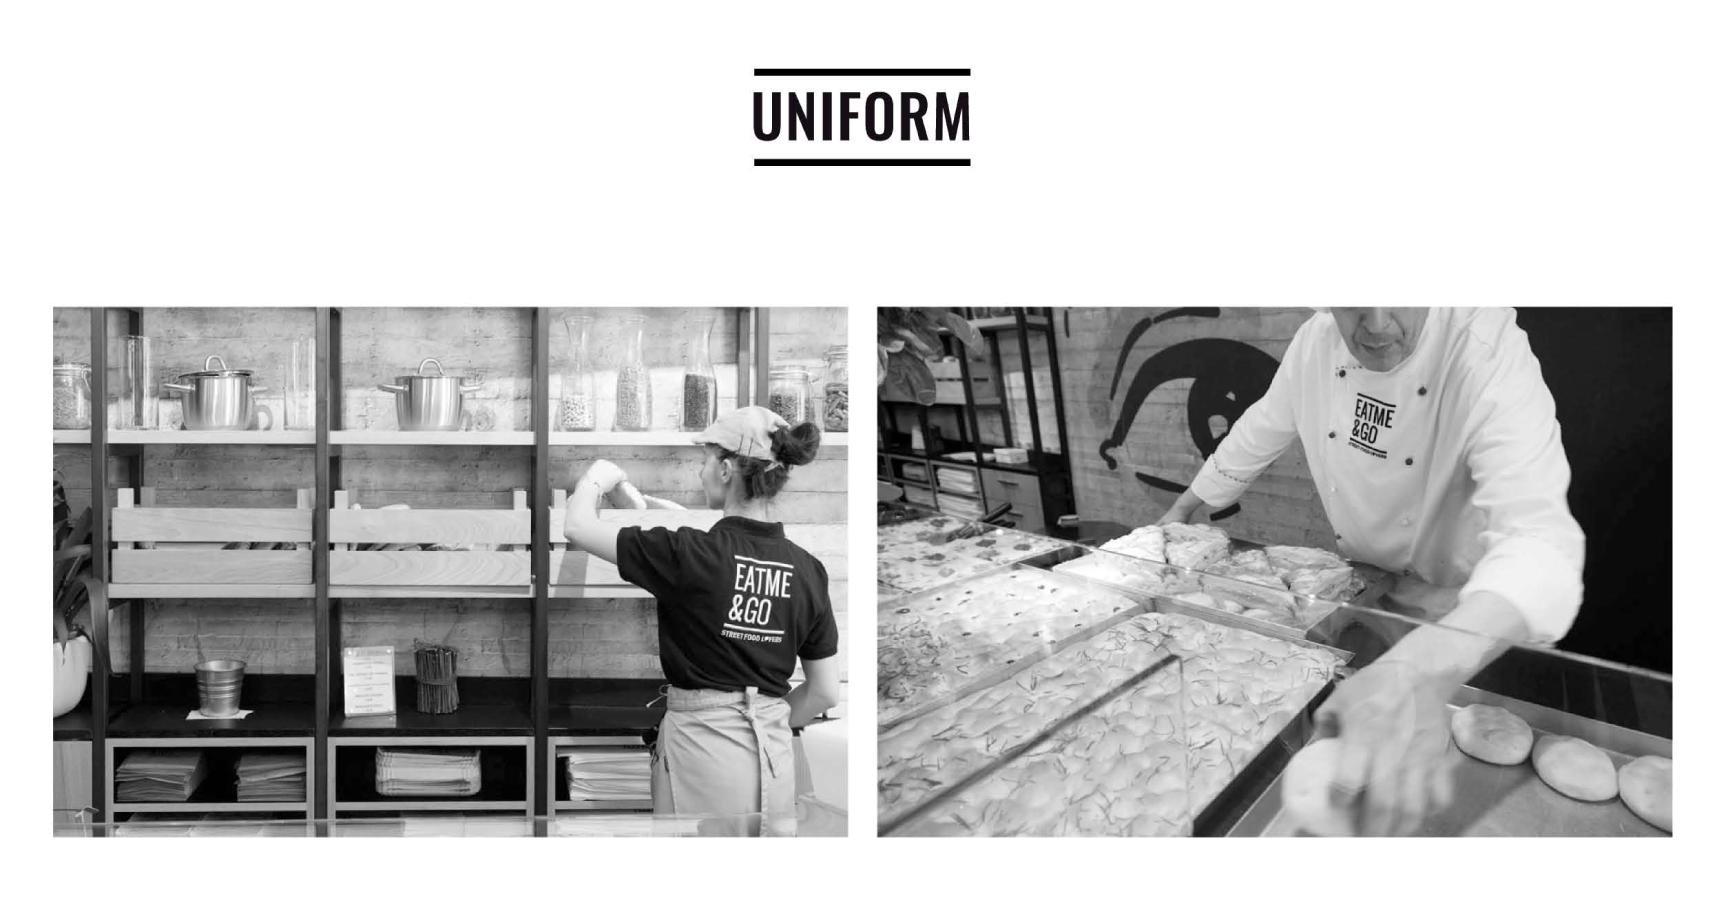 mintlab-brandidentyty-eatme&go-uniform